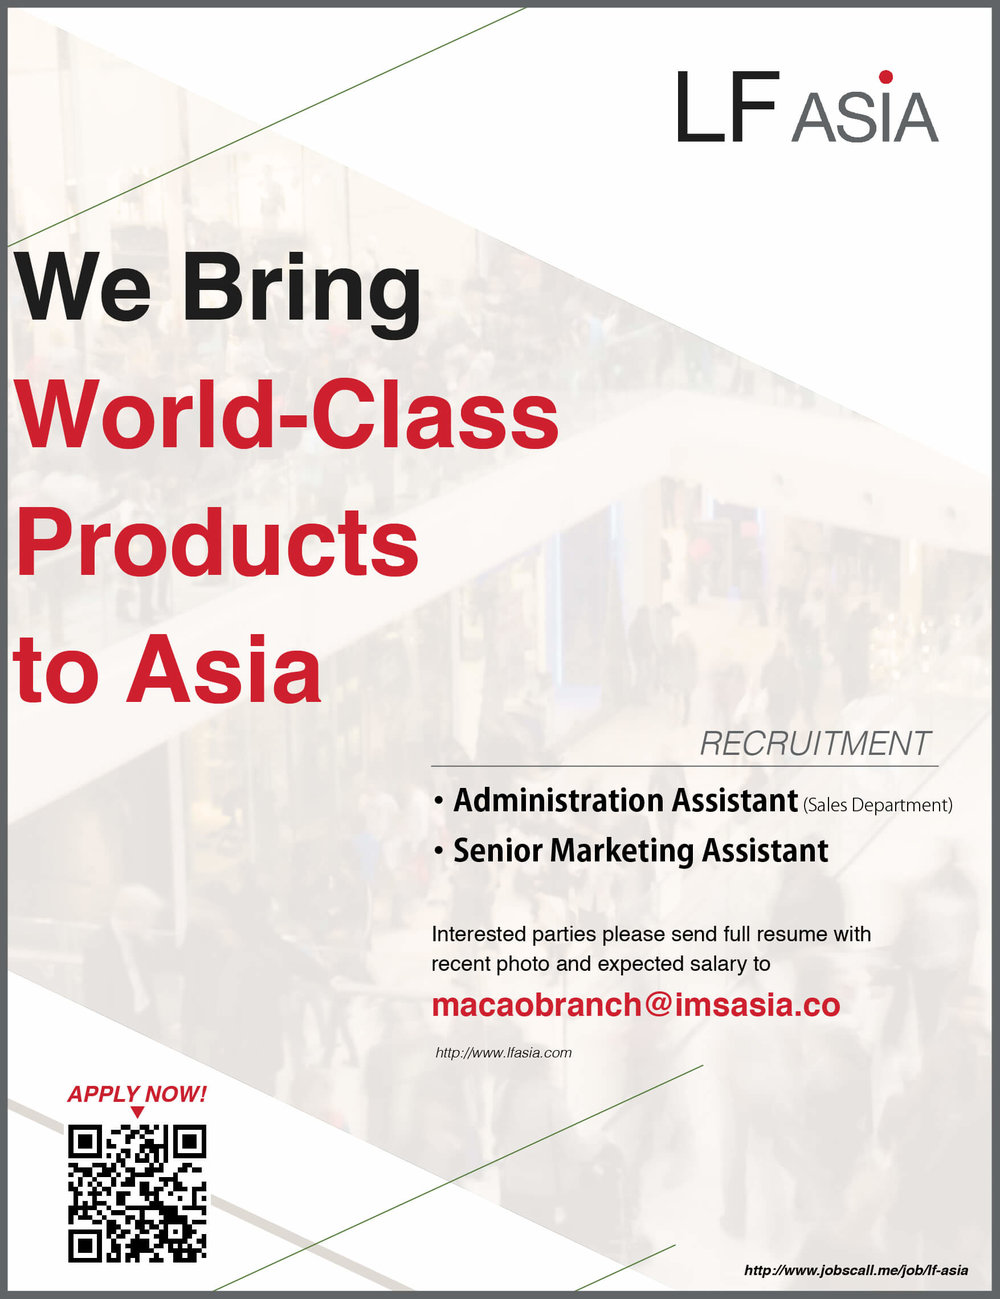 2019 LF Asia 澳門招聘 www.jobscall.me-01-4.jpg